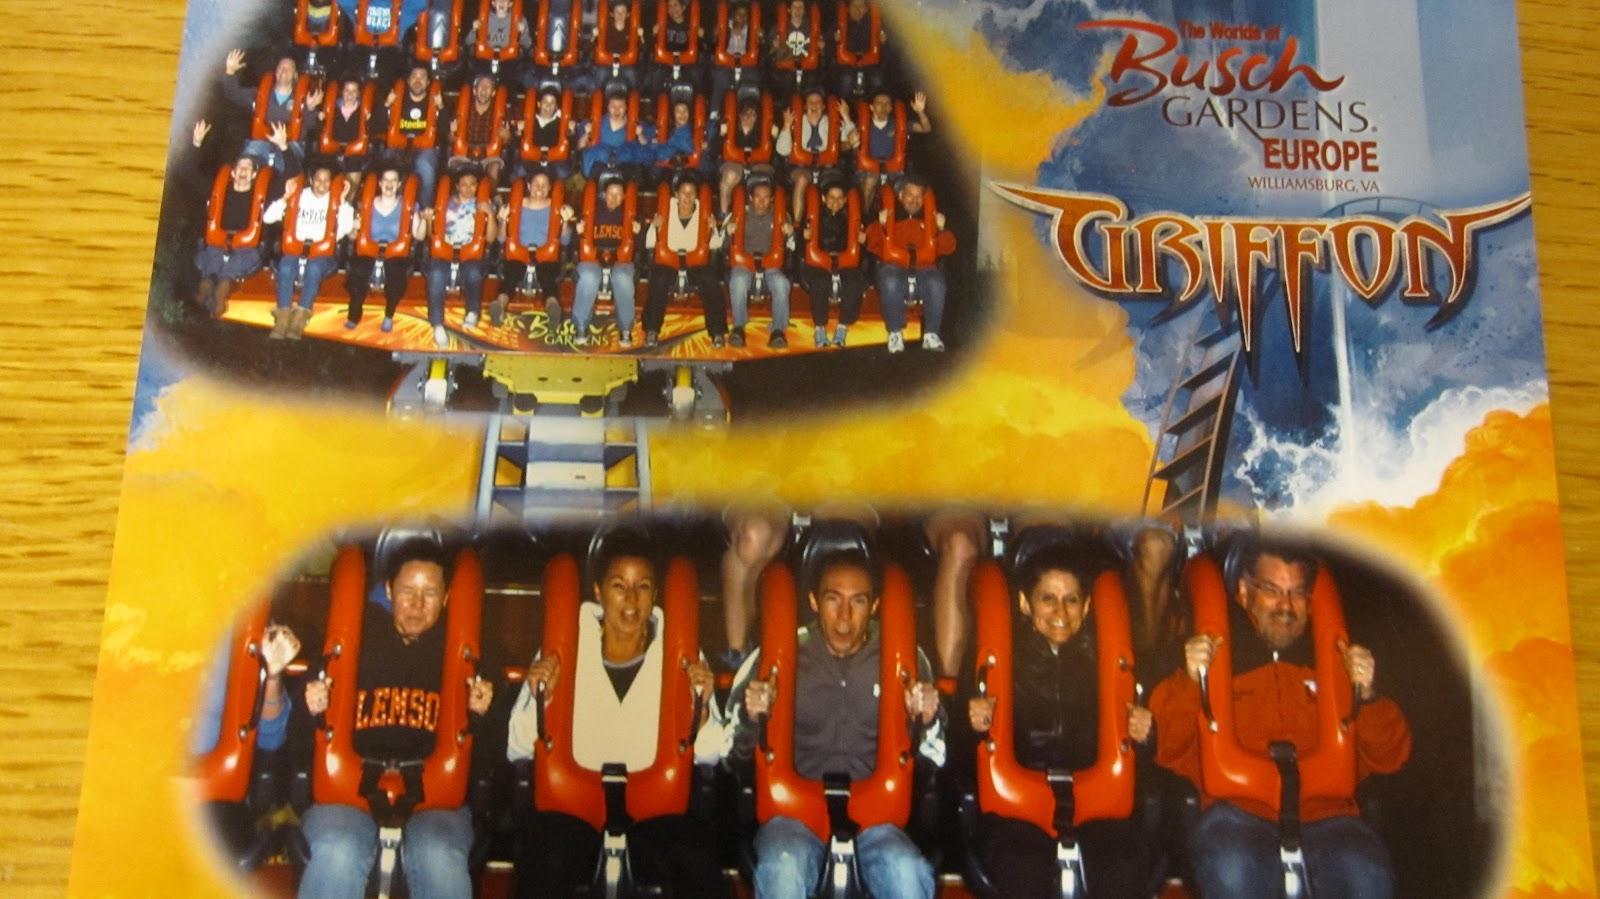 Bobbie\'s Roller Coaster And Theme Park Reviews: 04/30/12